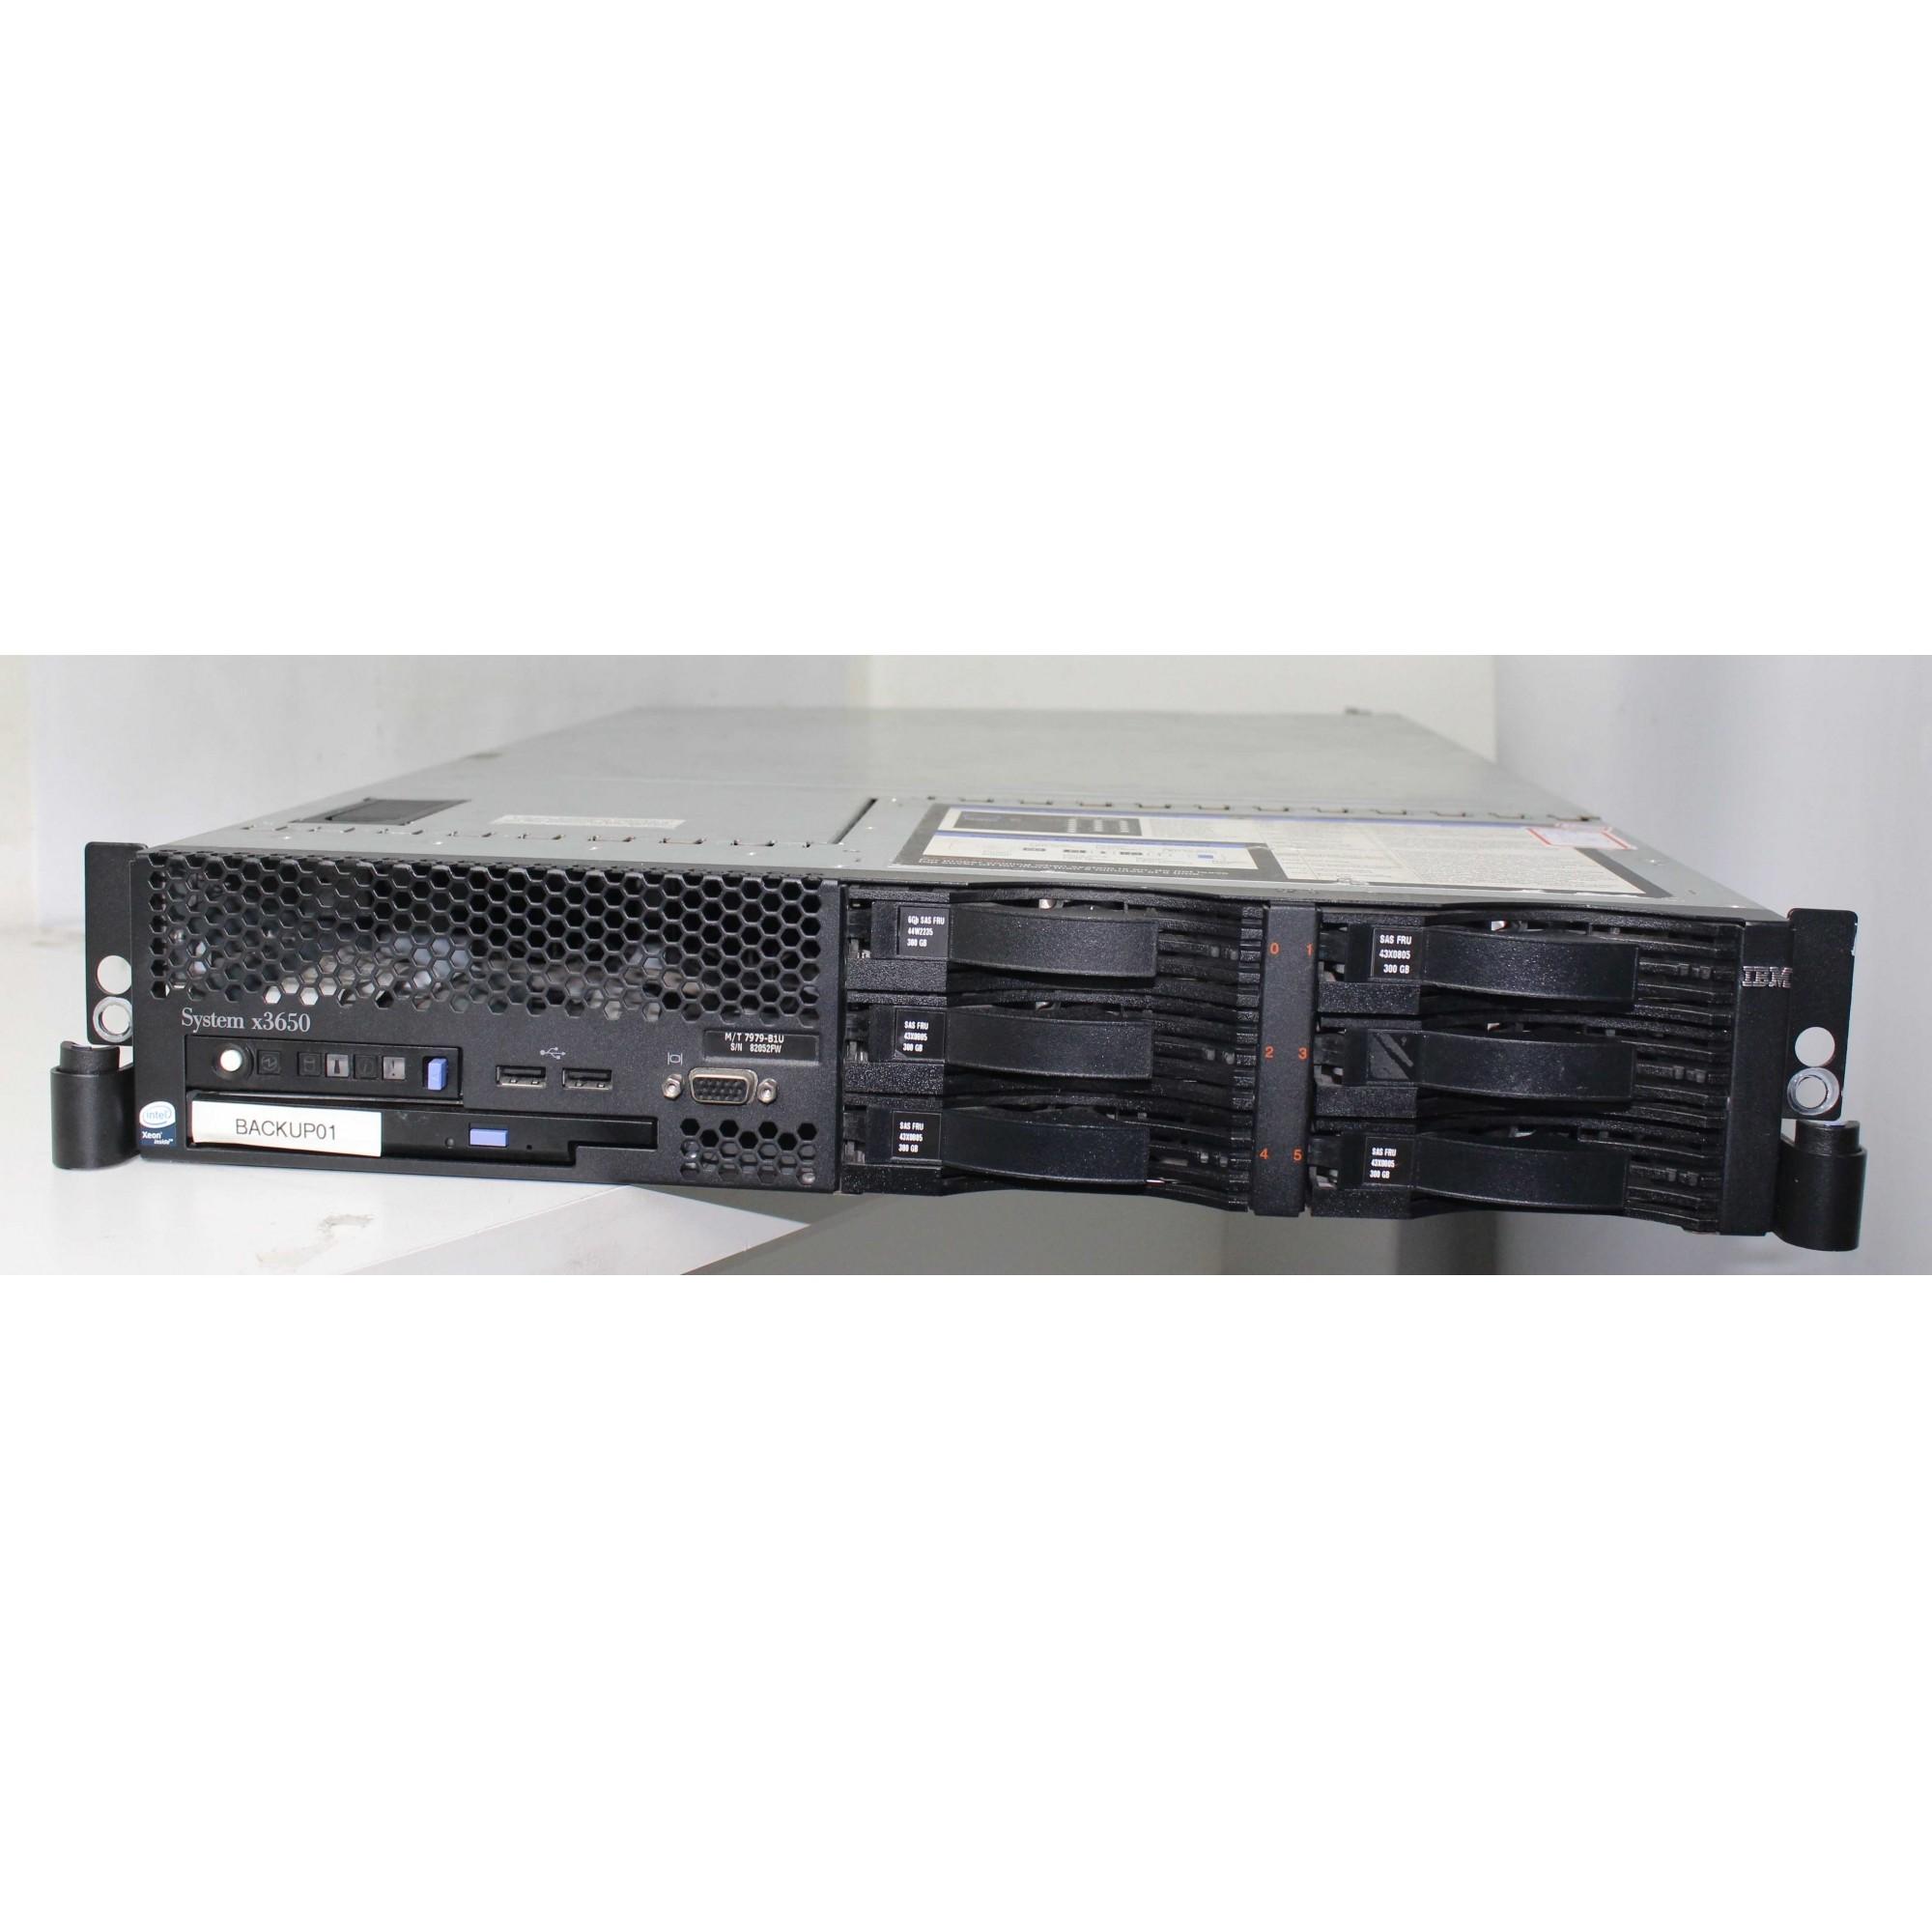 Servidor IBM System x3650 2X Intel Xeon 2GHz 16GB 5X HD-300GB (Não enviamos)